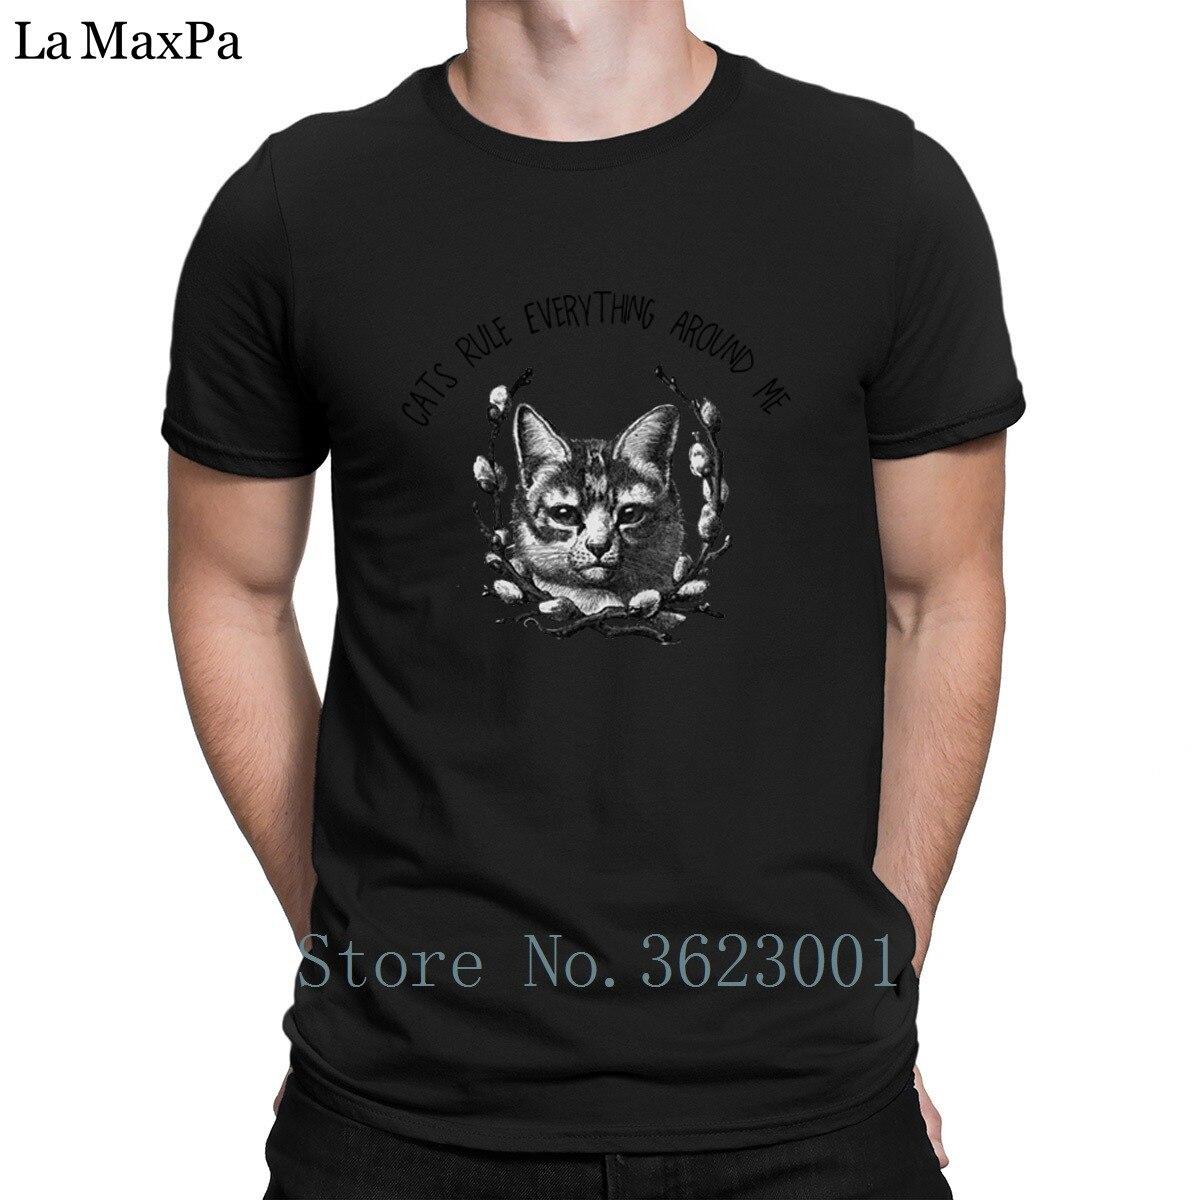 Design Interesting Men T Shirt C.R.E.A.M.In A Saucer Kthxbai Tshirt Summer Letters T-Shirt For Men New Mens Tee Shirt Slim Fit